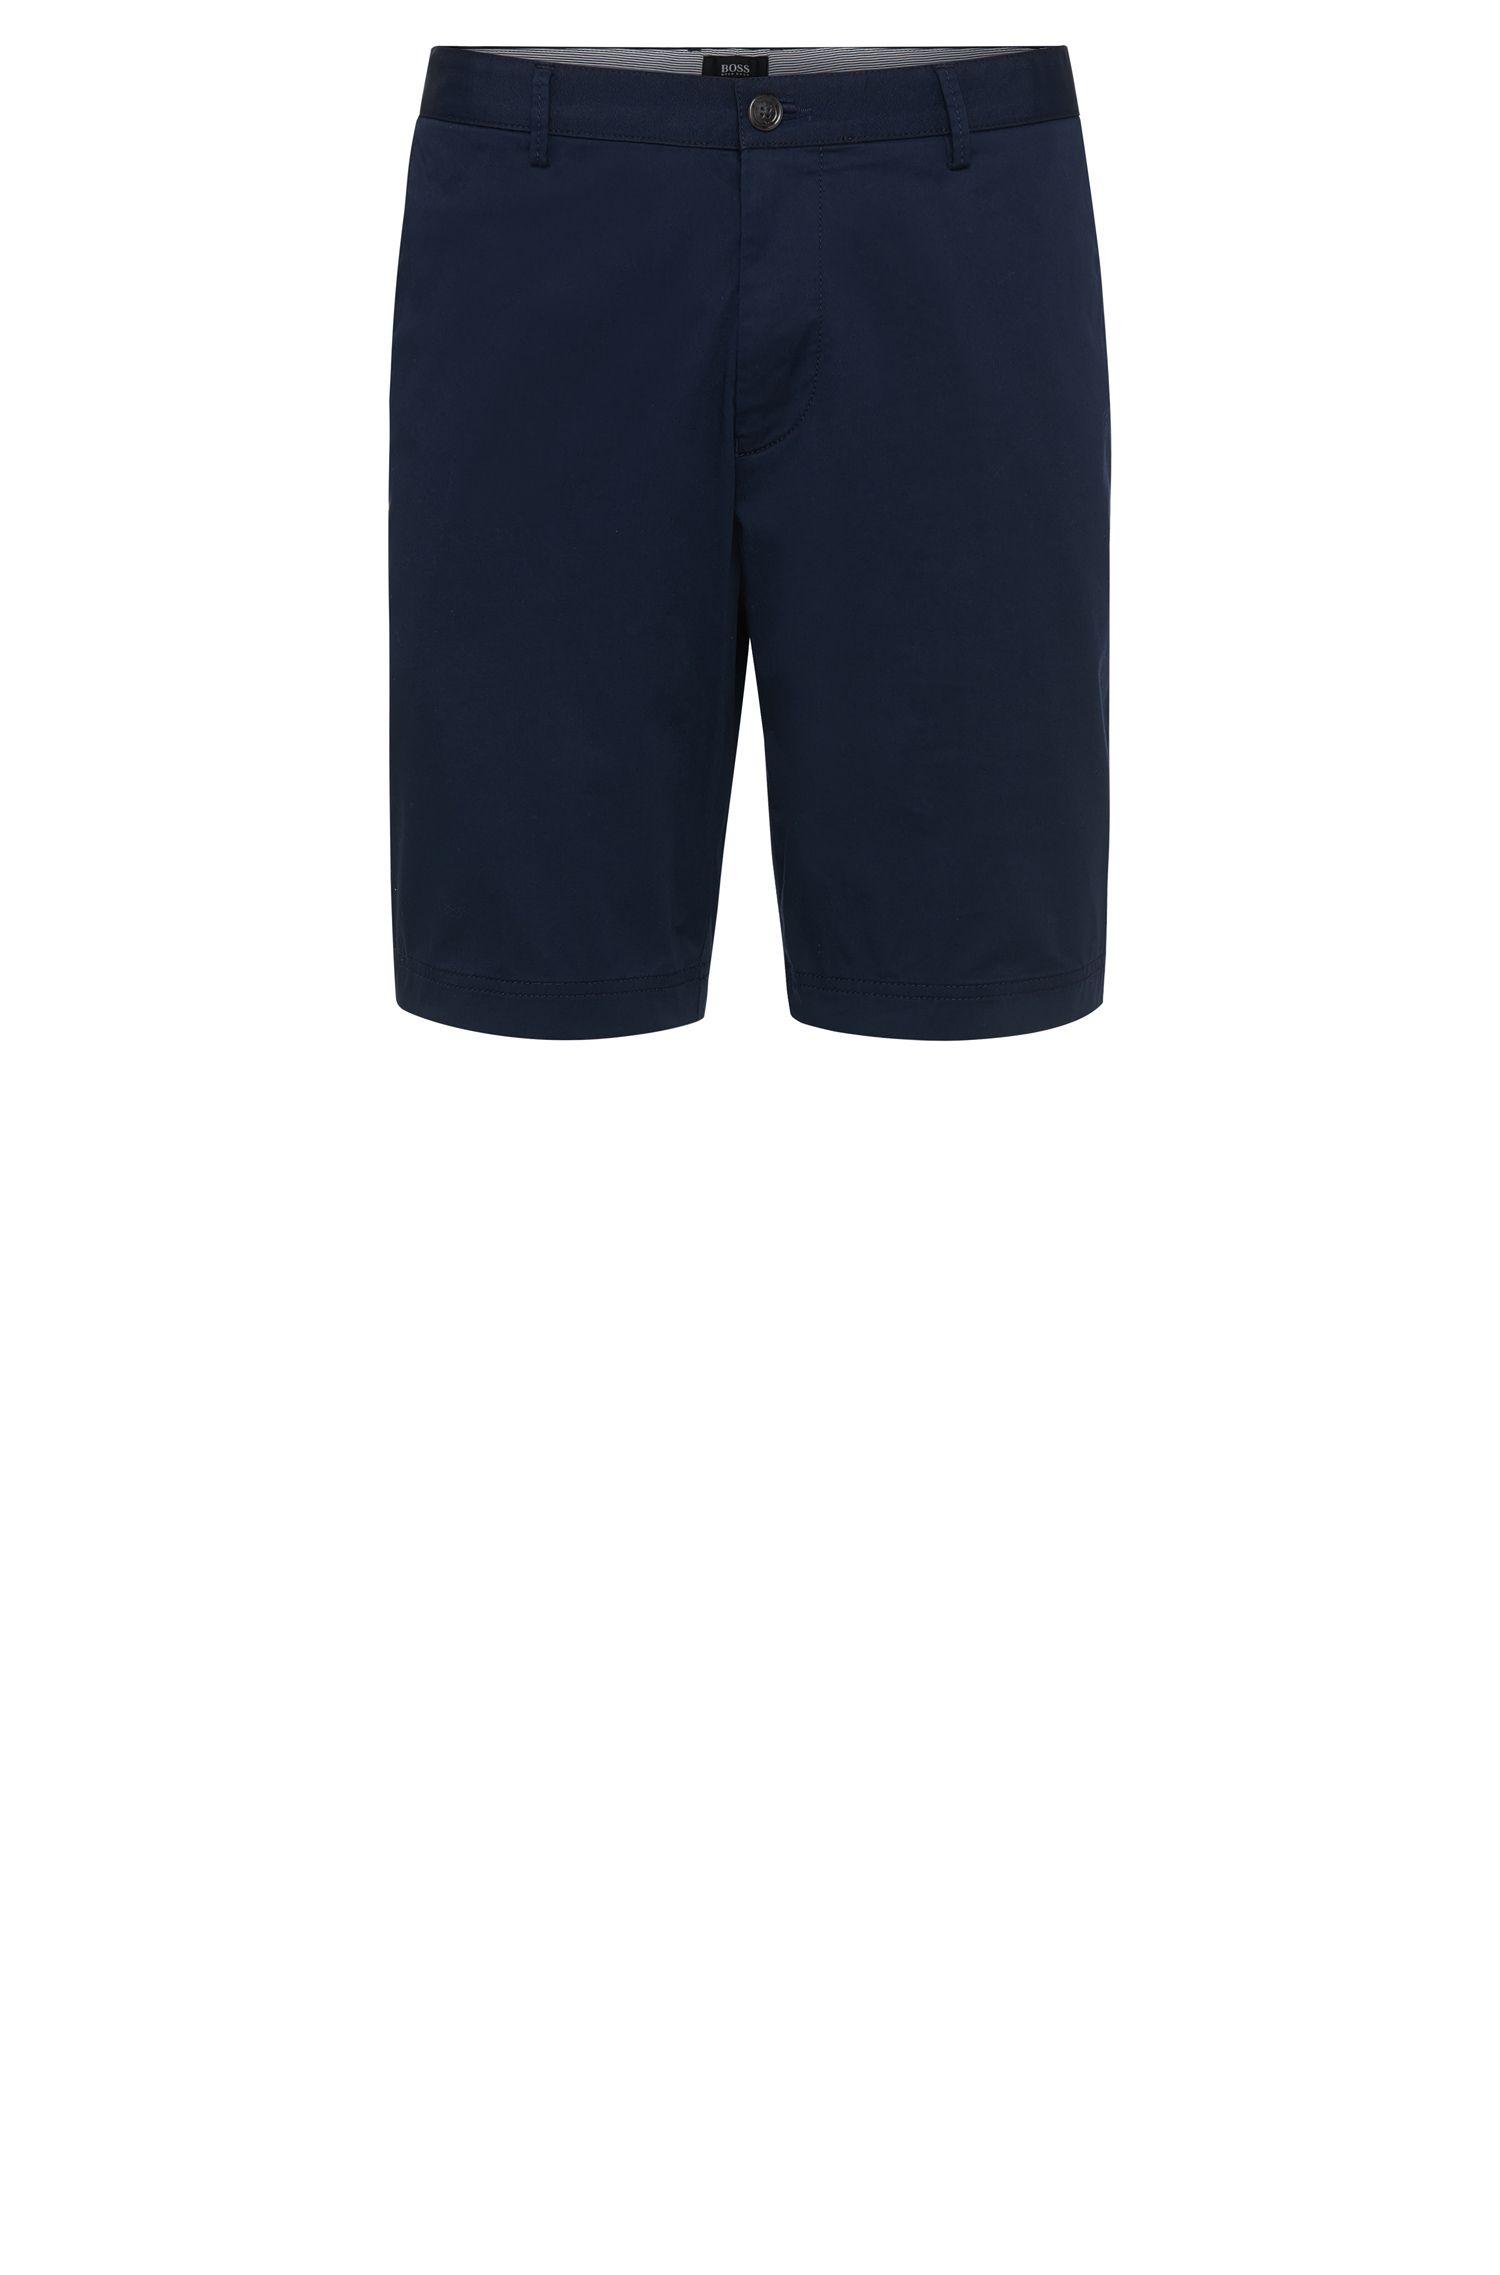 'Crigan-Short-W' | Regular Fit, Stretch Cotton Shorts